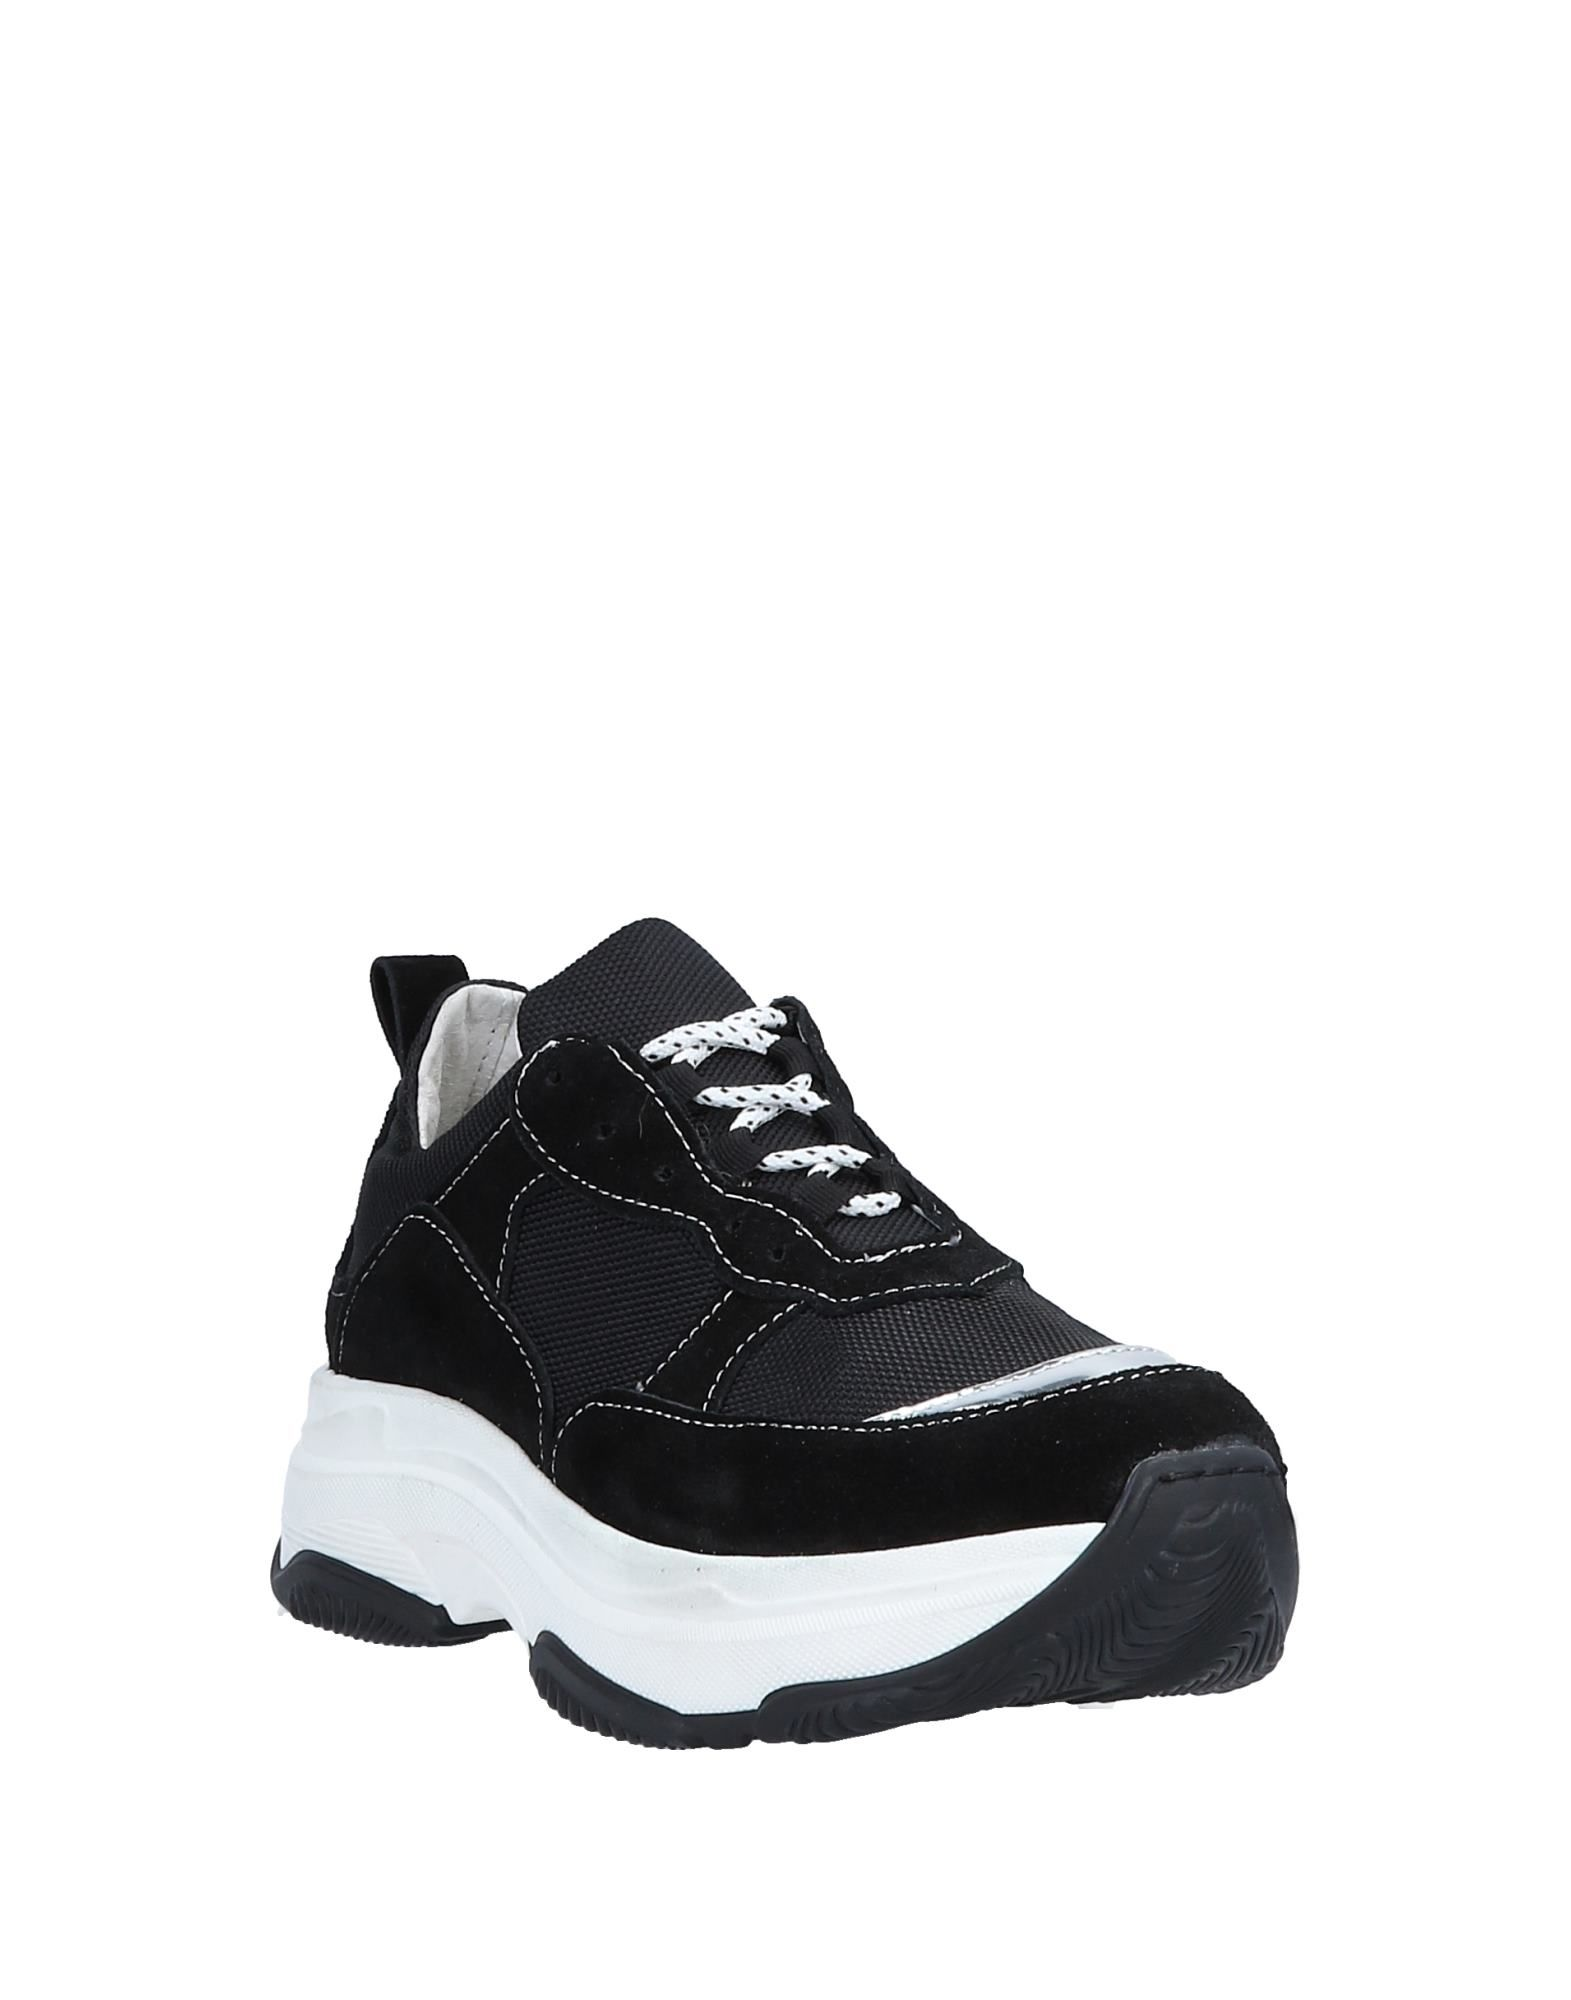 Divine Follie Gute Sneakers Damen  11563392VJ Gute Follie Qualität beliebte Schuhe 67ad07